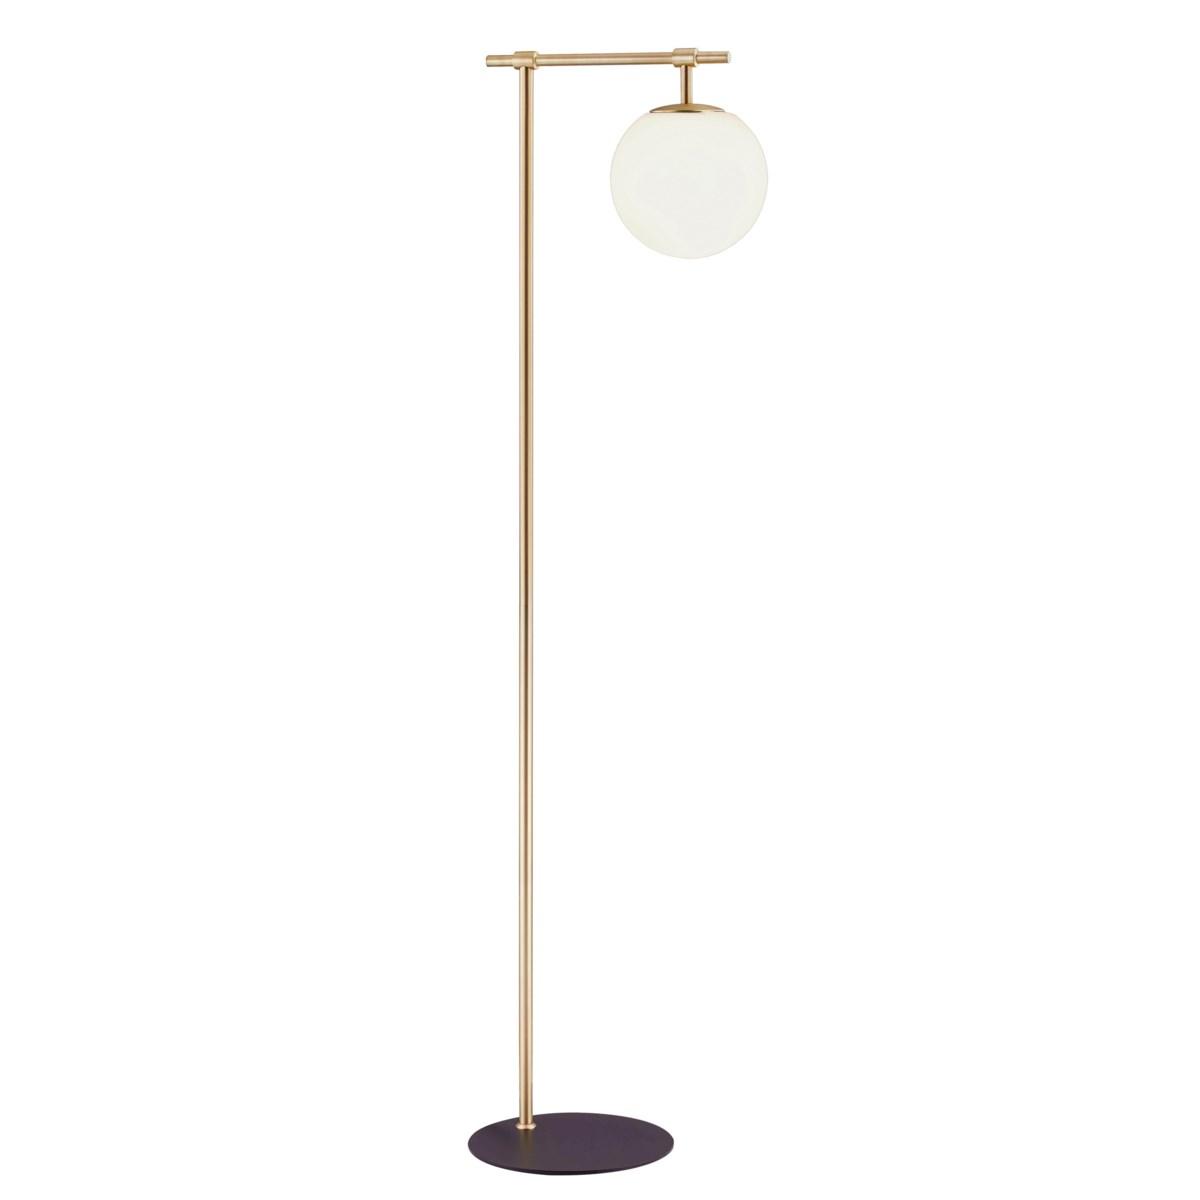 LENCHO FLOOR LAMP